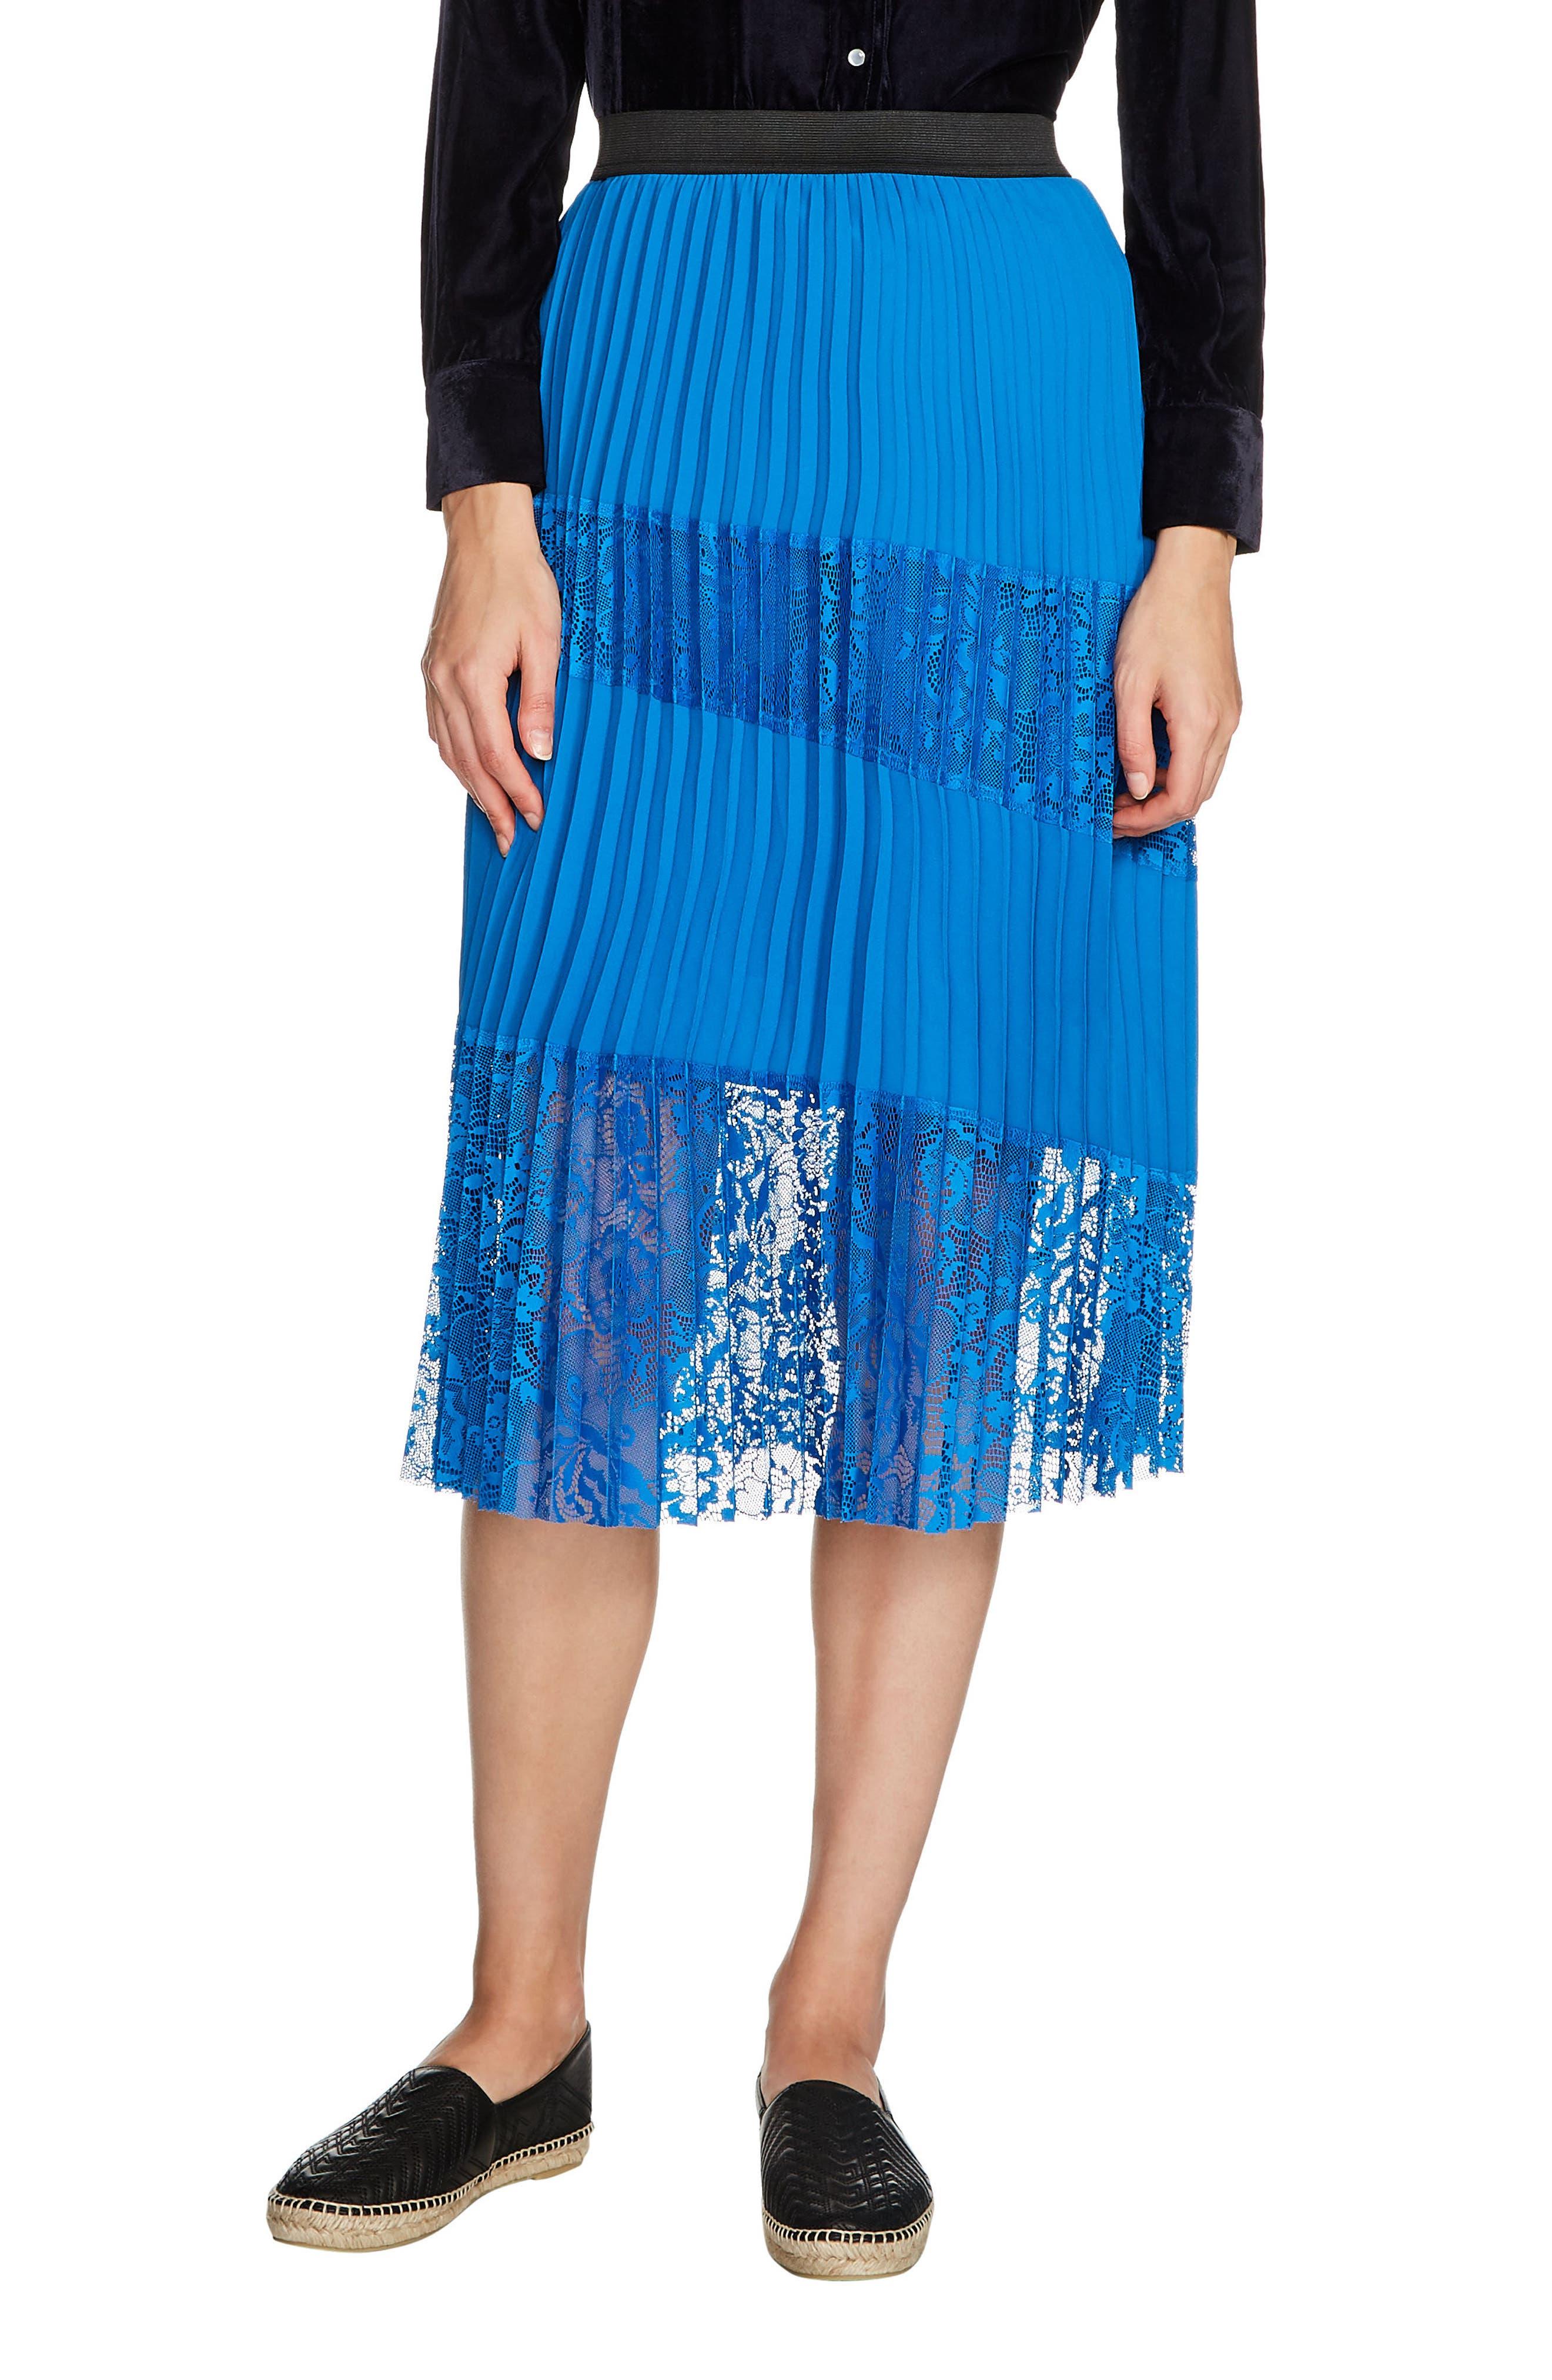 Jarane Lace Inset Pleated Midi Skirt,                             Main thumbnail 1, color,                             401